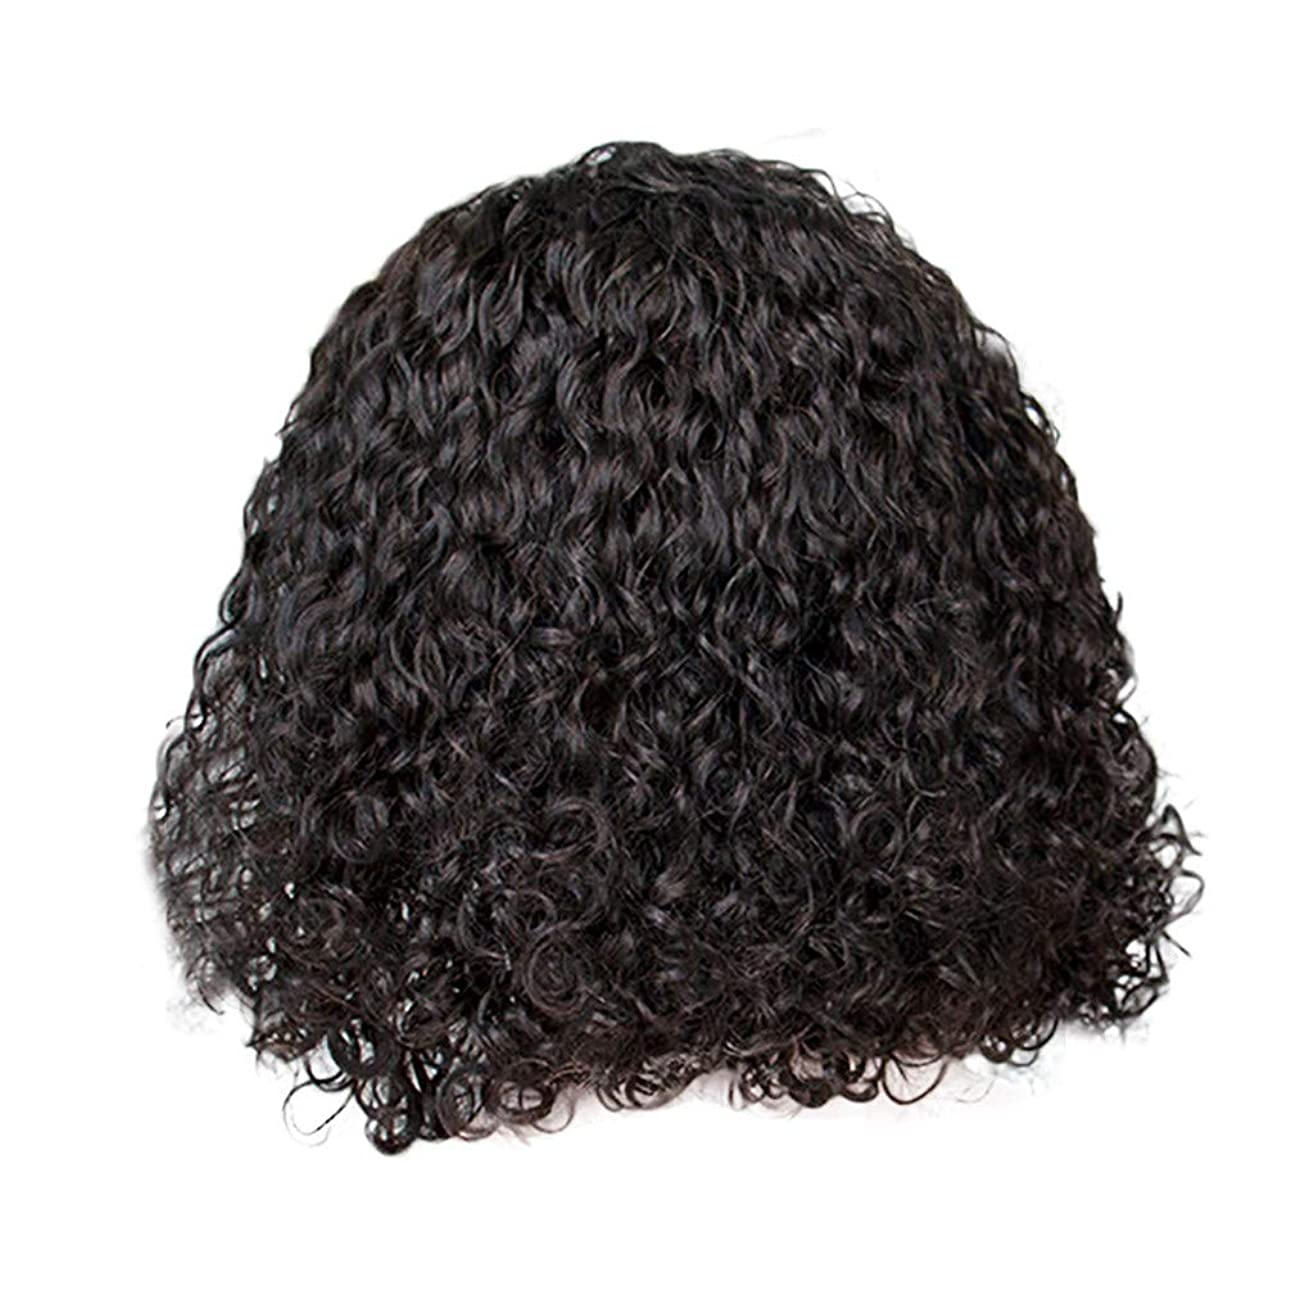 Sonmer Women Brazilian Less Rose Hair Net Wave Black Natural Looking Wigs,14inch